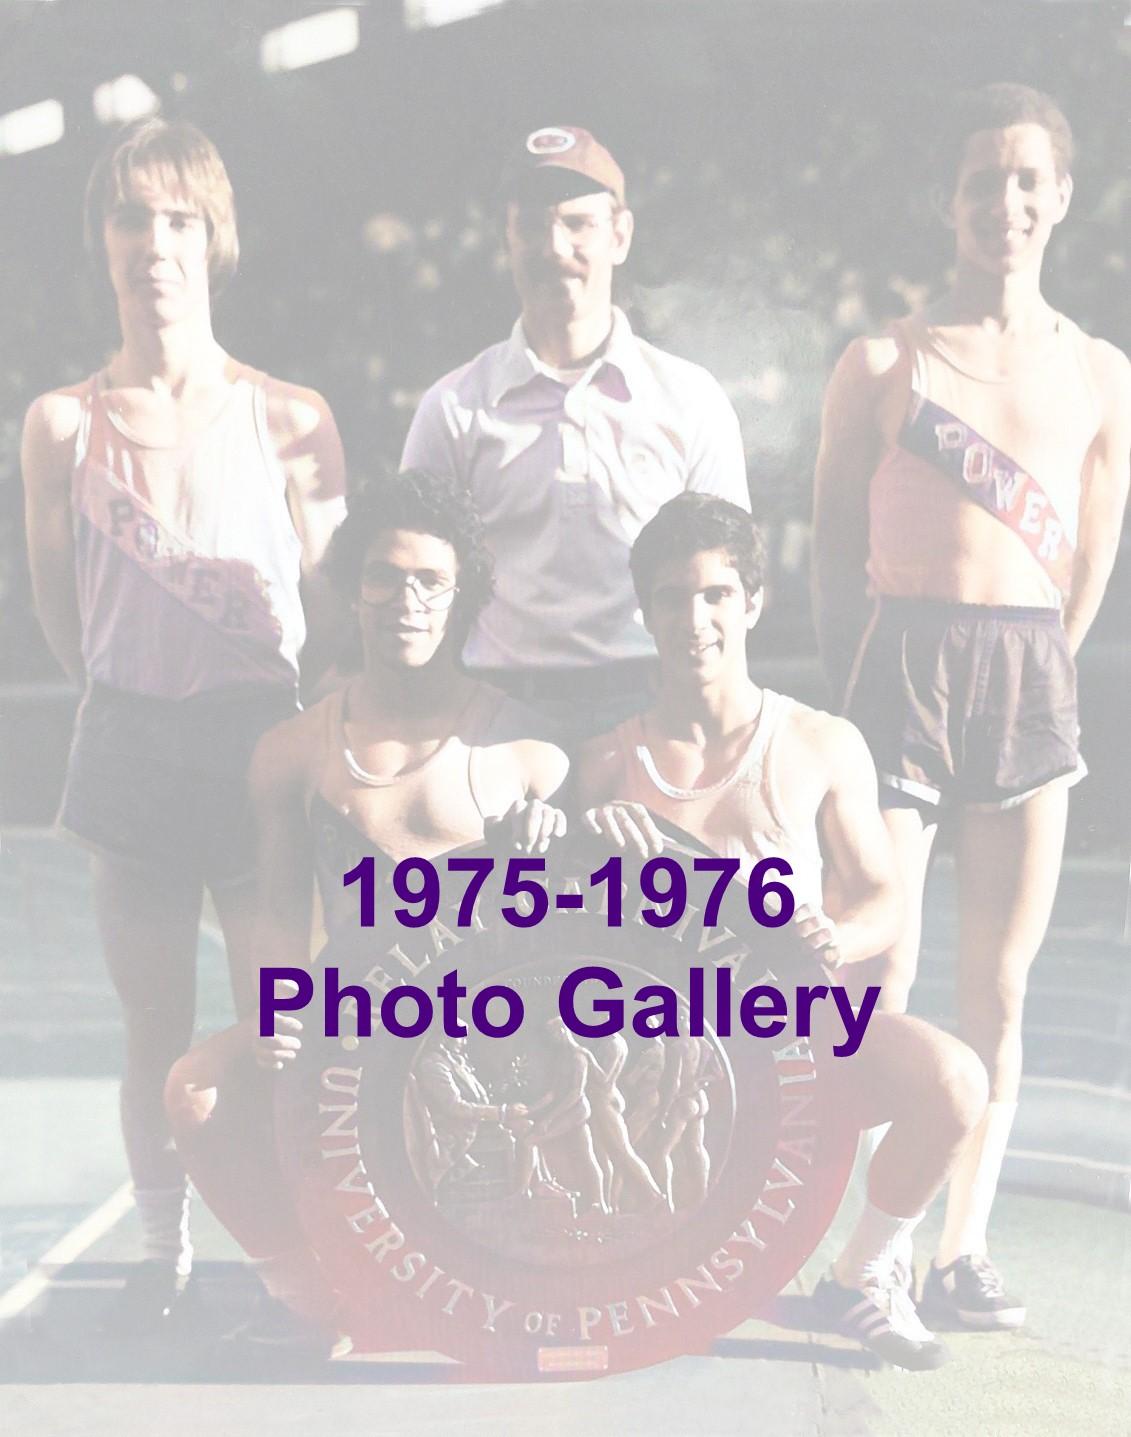 1975-1976 Photo Gallery